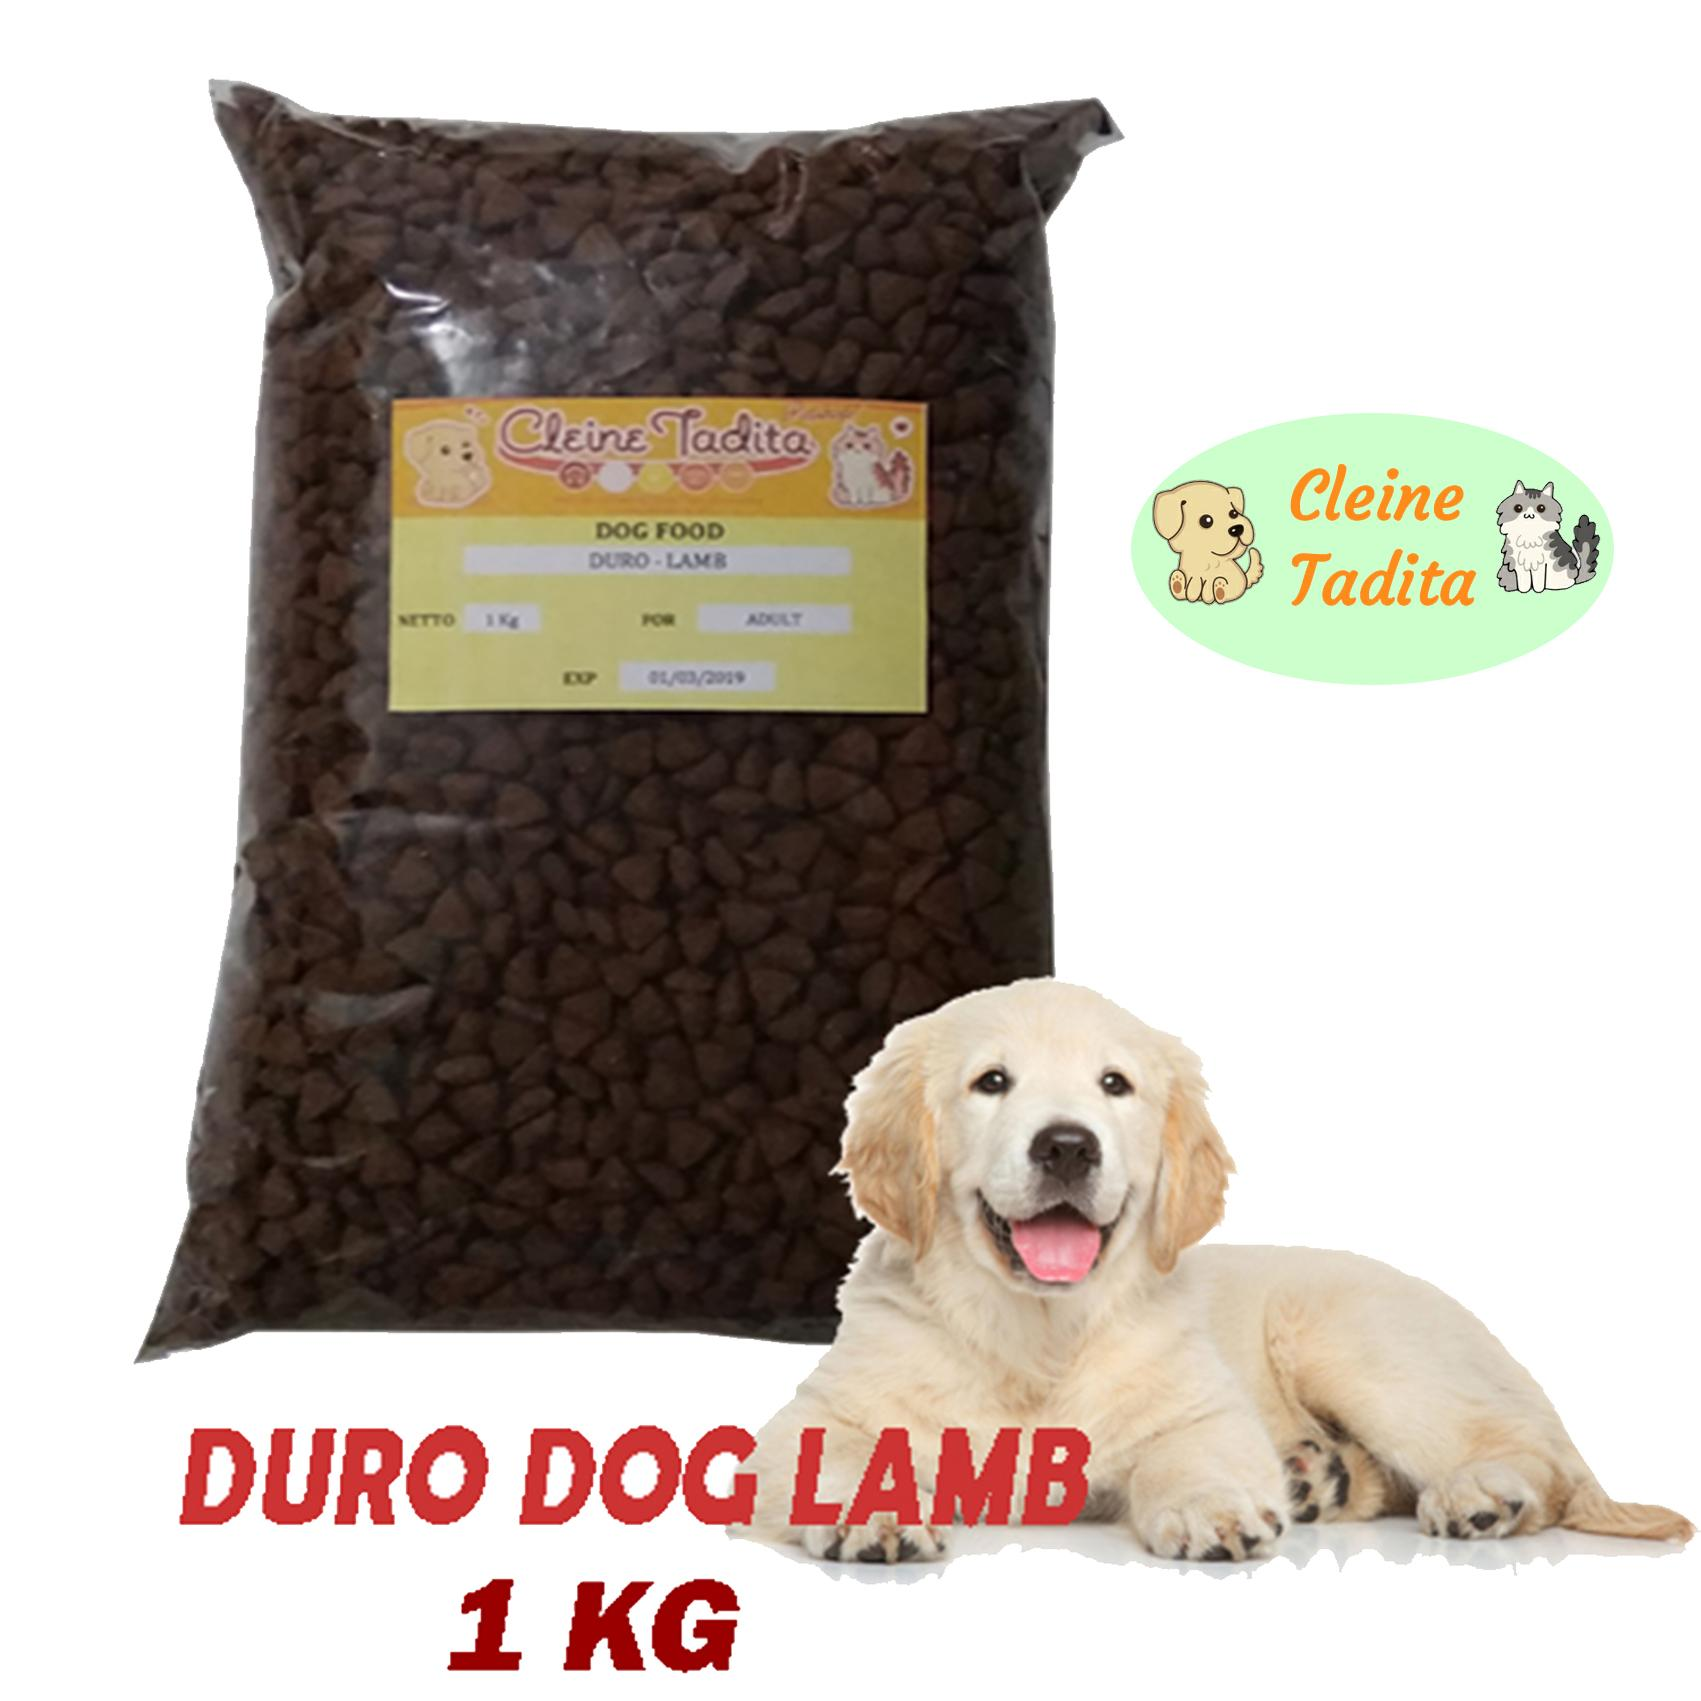 Cleine Tadita Petshop - Makanan Anjing Duro Lamb Repack 1kg By Cleine Tadita Petshop